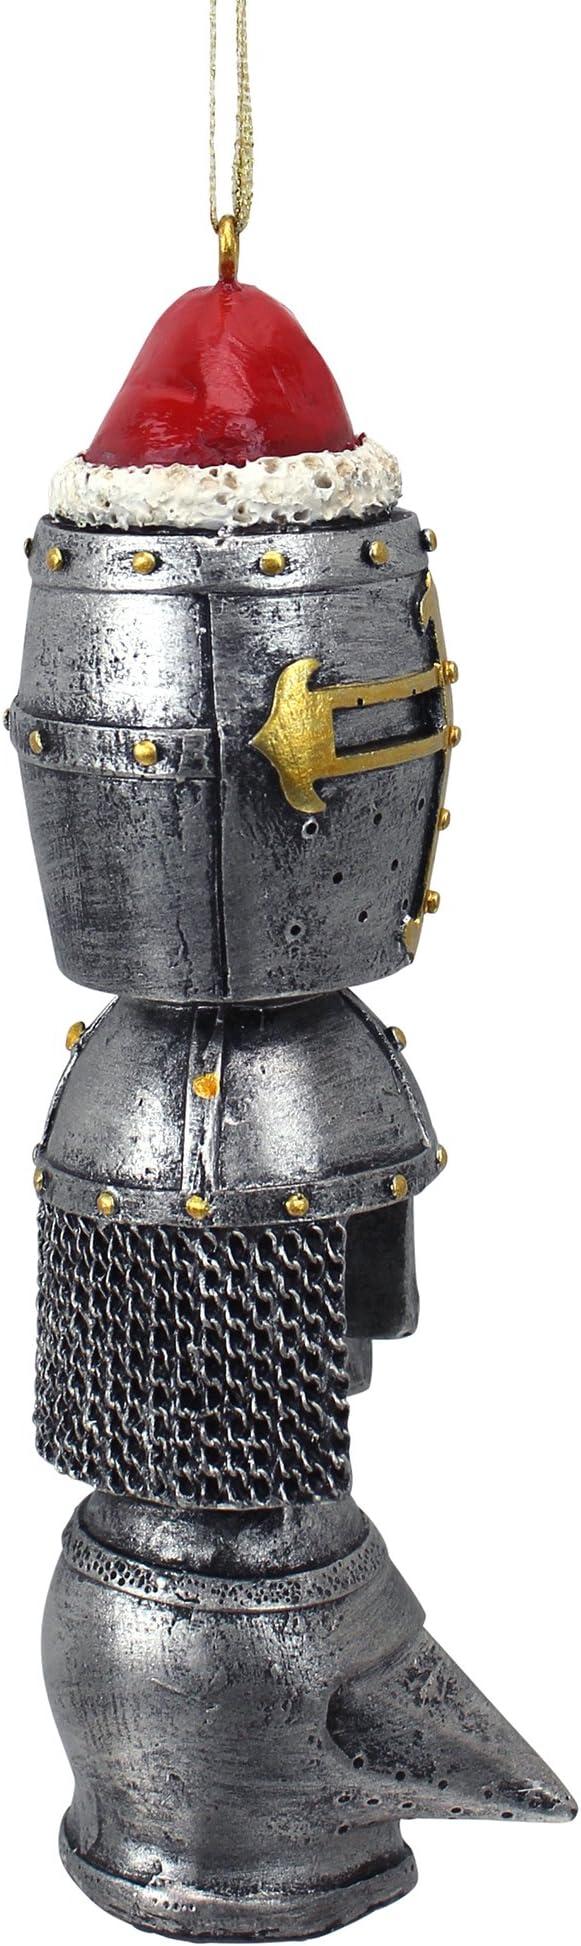 12,5/x 4/x 12,5/cm de la Marca Resina Adorno de Vacaciones Pack of 1 Design Toscano T/ótem de Cascos Medievales